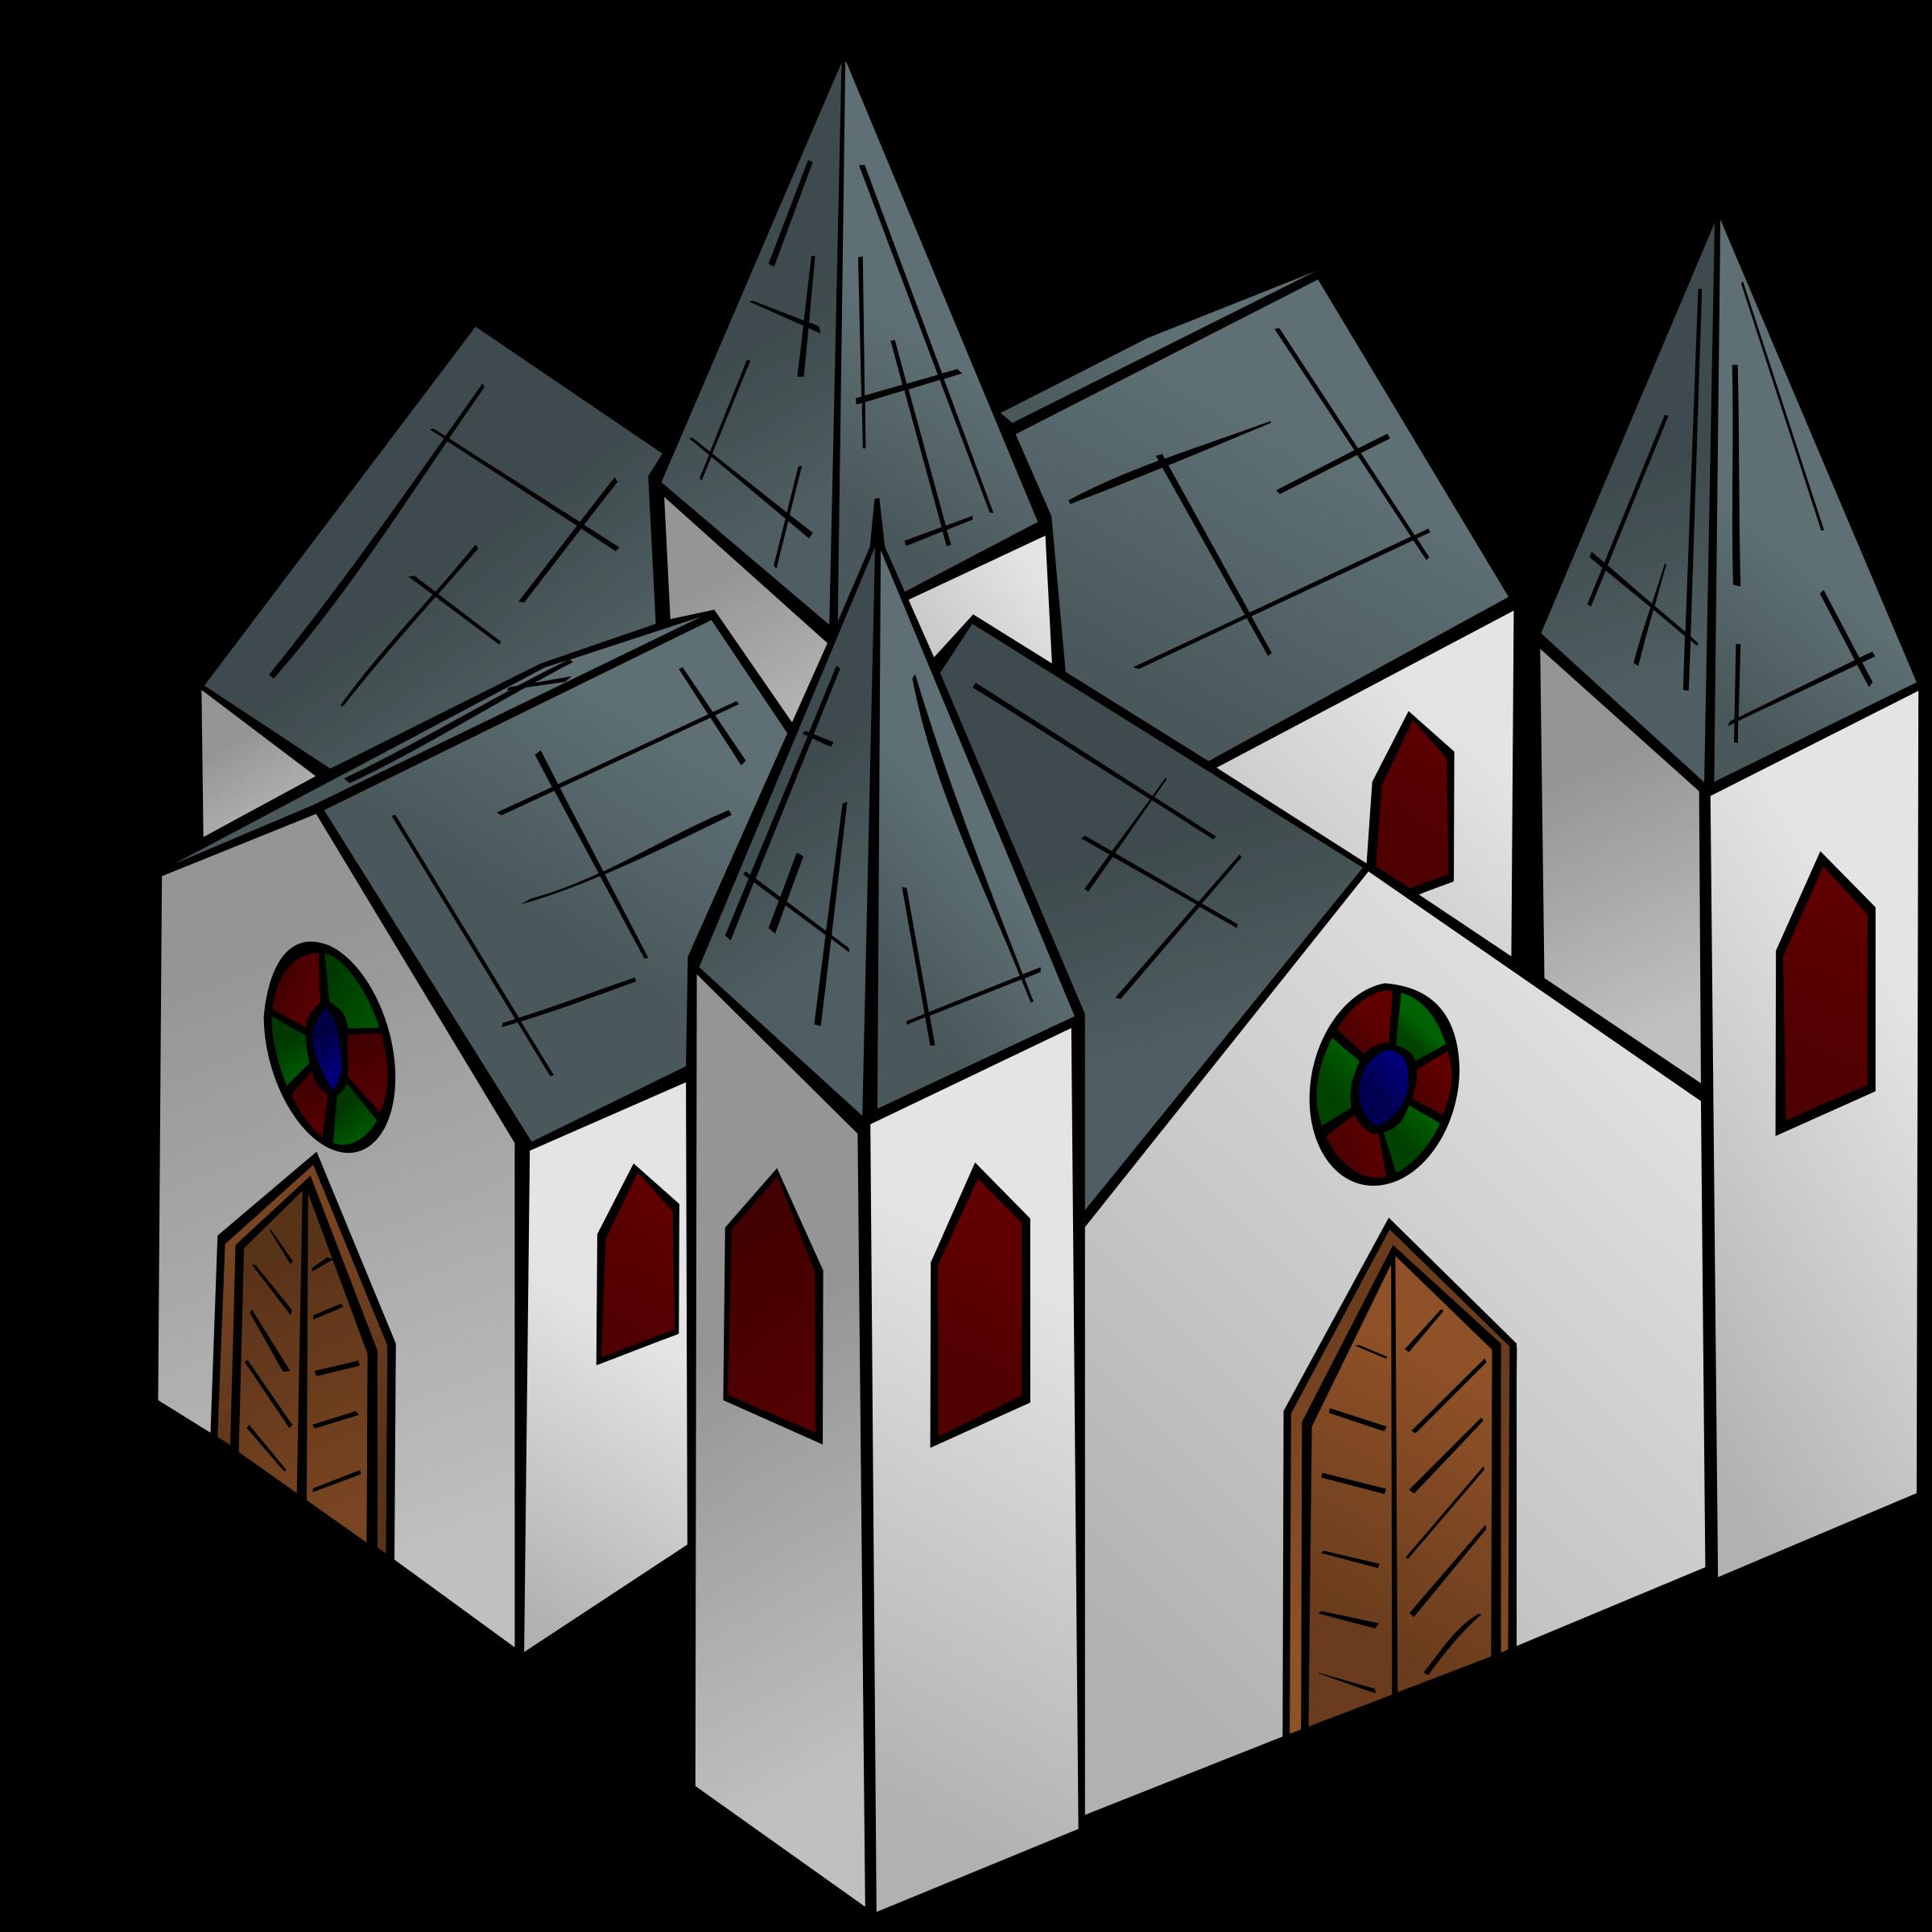 Rpg map symbols cathedral. Medieval clipart medieval symbol